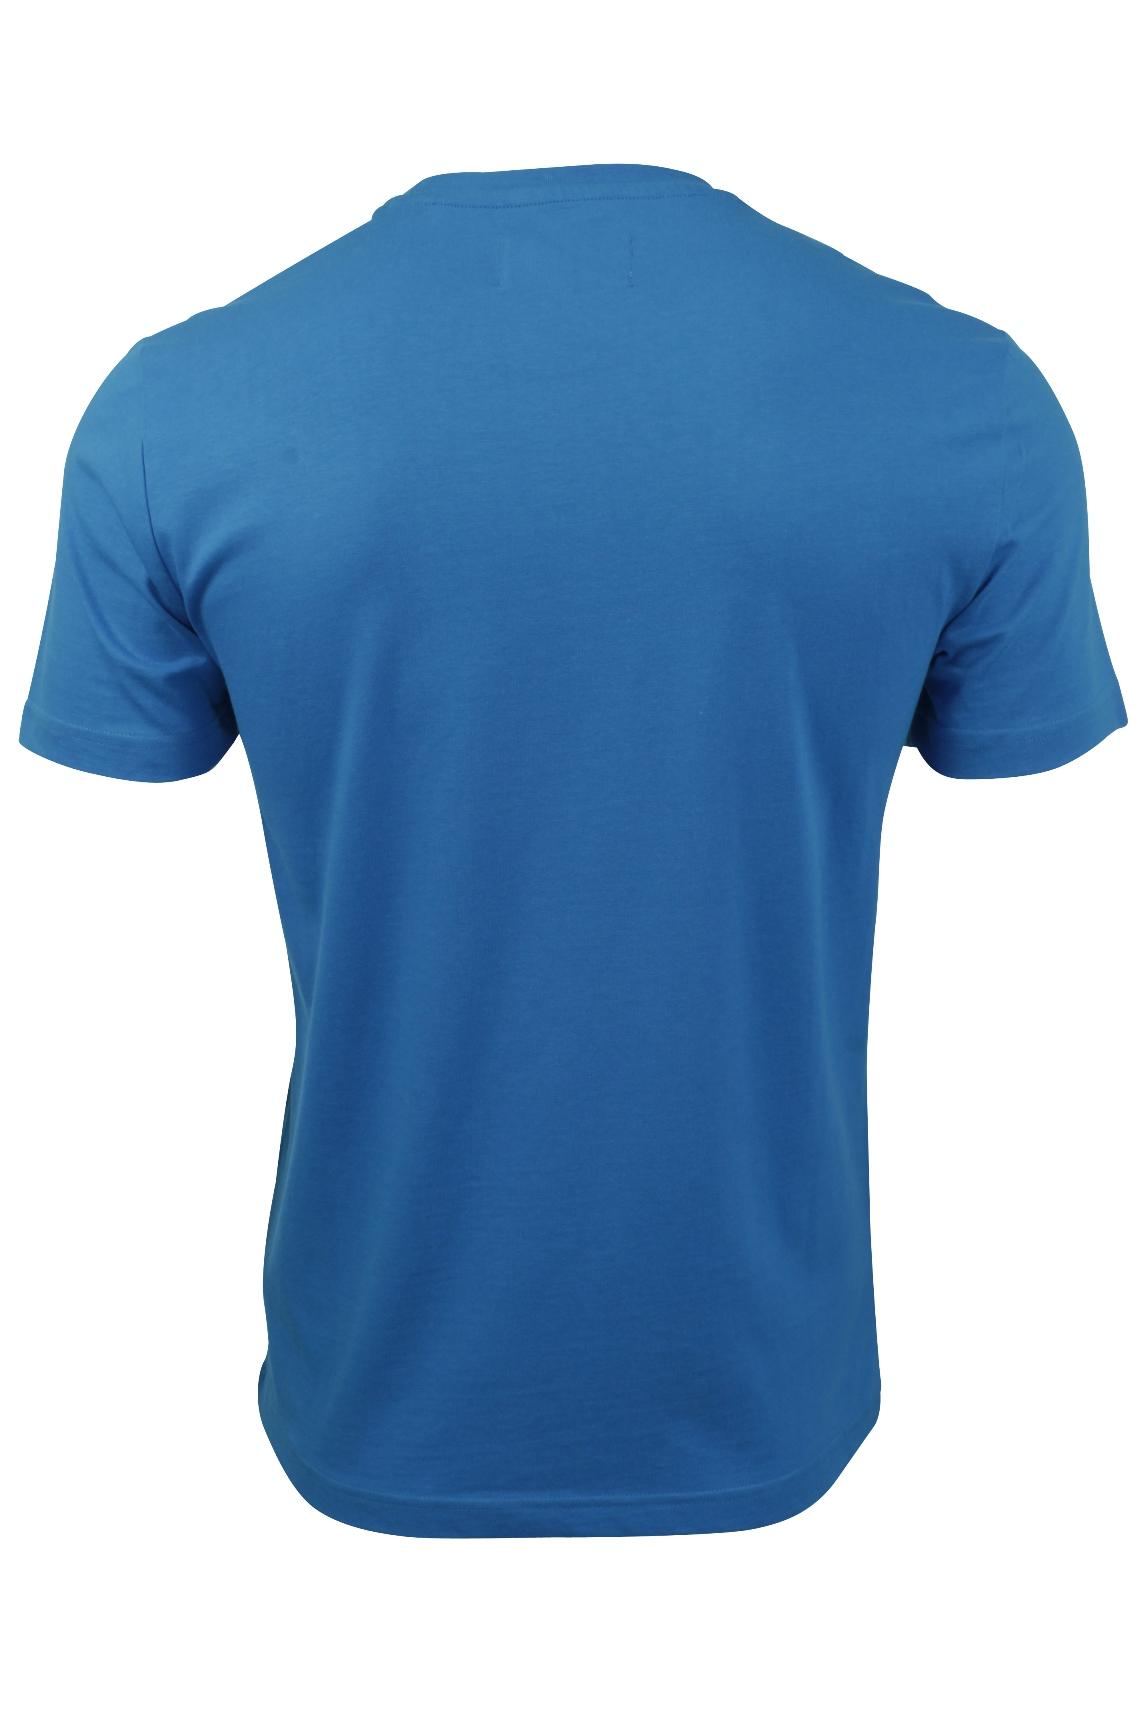 Mens-T-Shirt-by-Original-Penguin-Crew-Neck-Short-Sleeved thumbnail 23